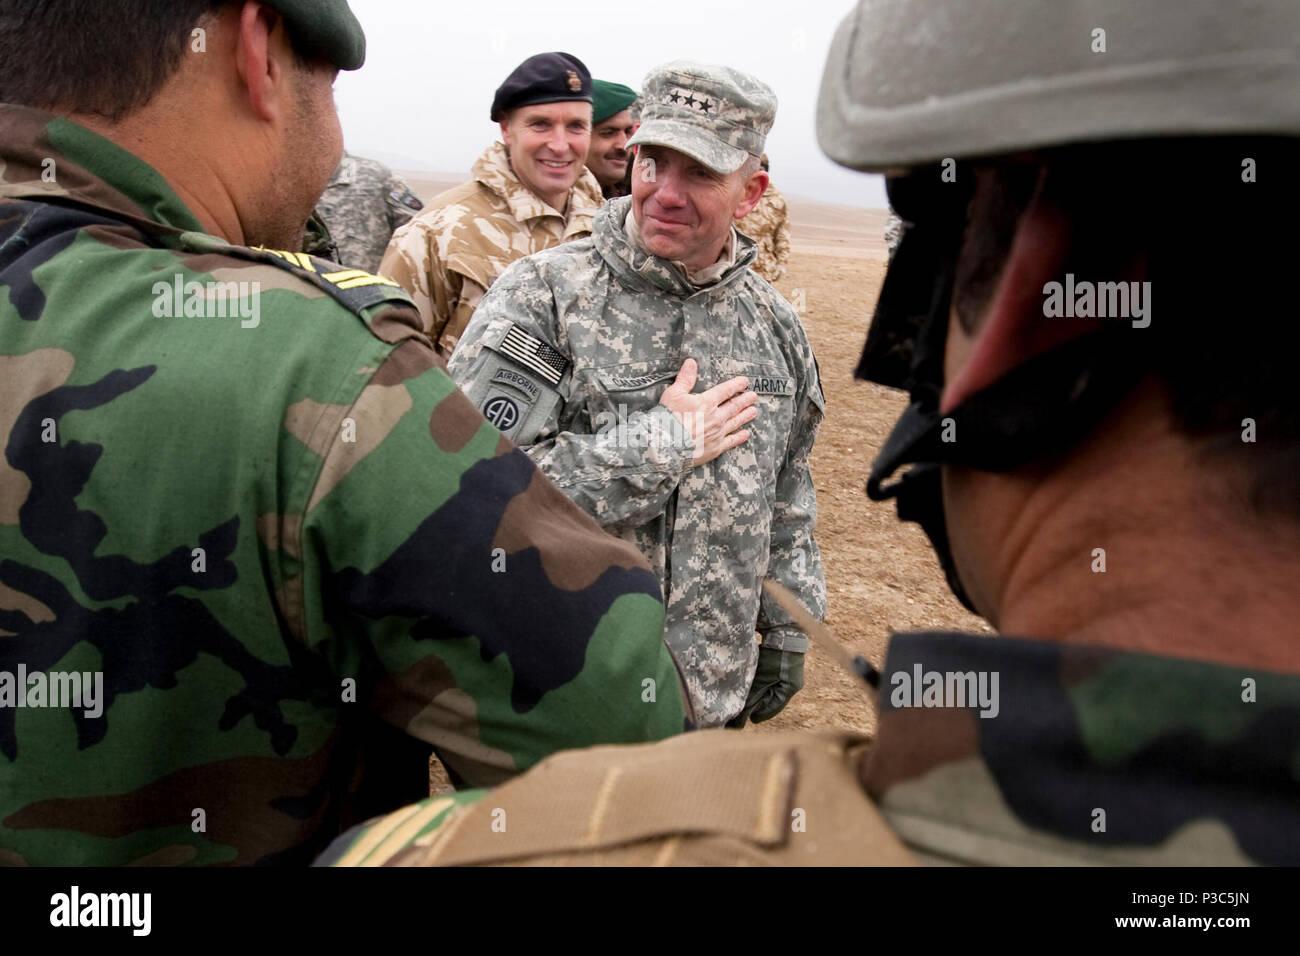 Troops Afghanistan Base Stock Photos 1209 Kemeja Army Black Dec 9 2009 Lt Gen William B Caldwell